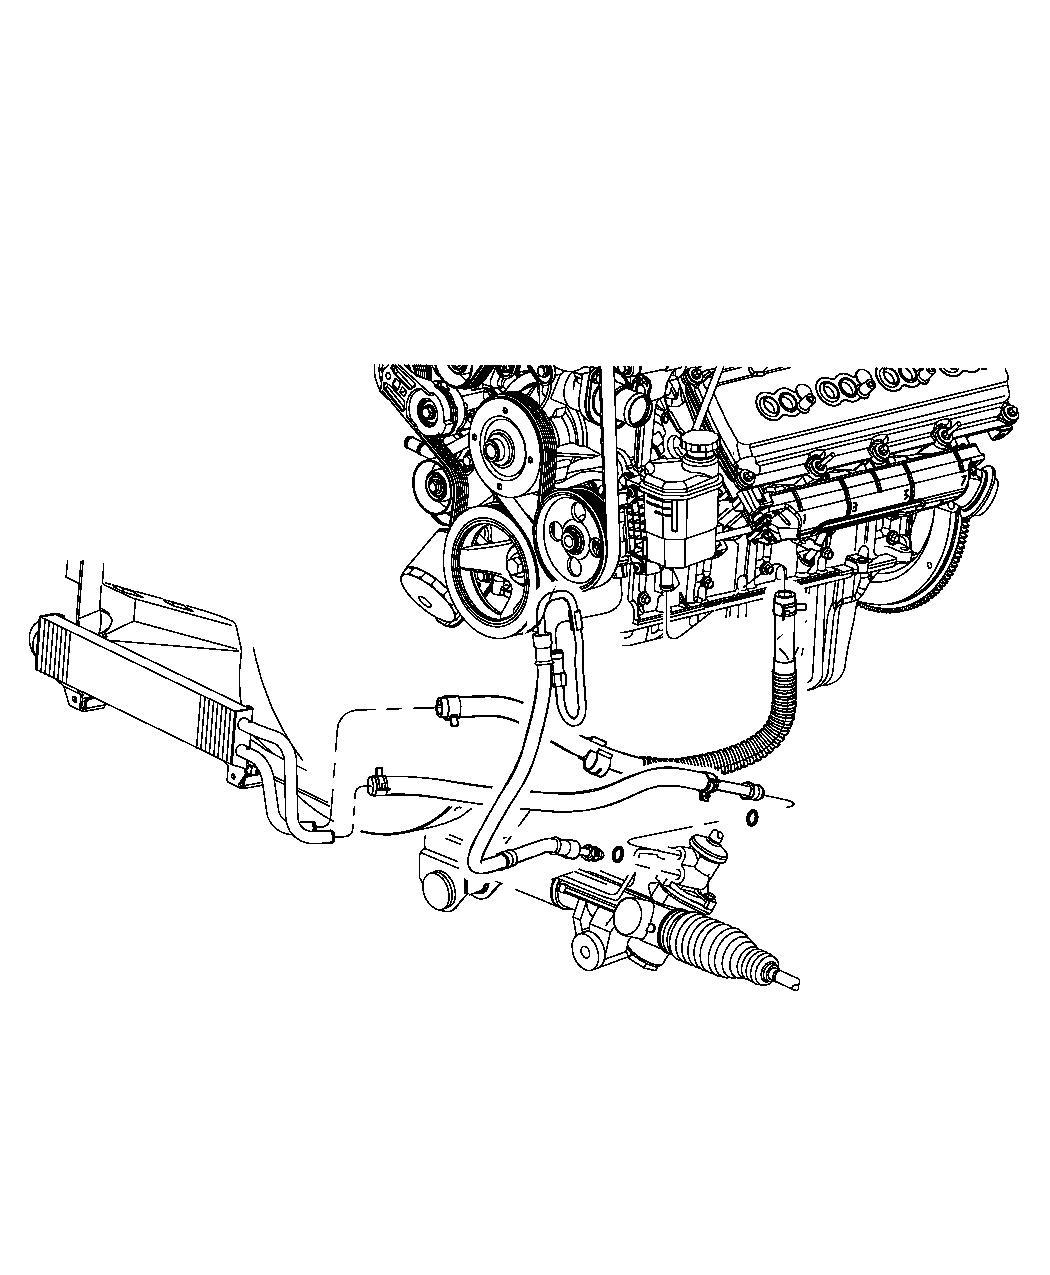 Ram Cooler Power Steering Front End Parts Module